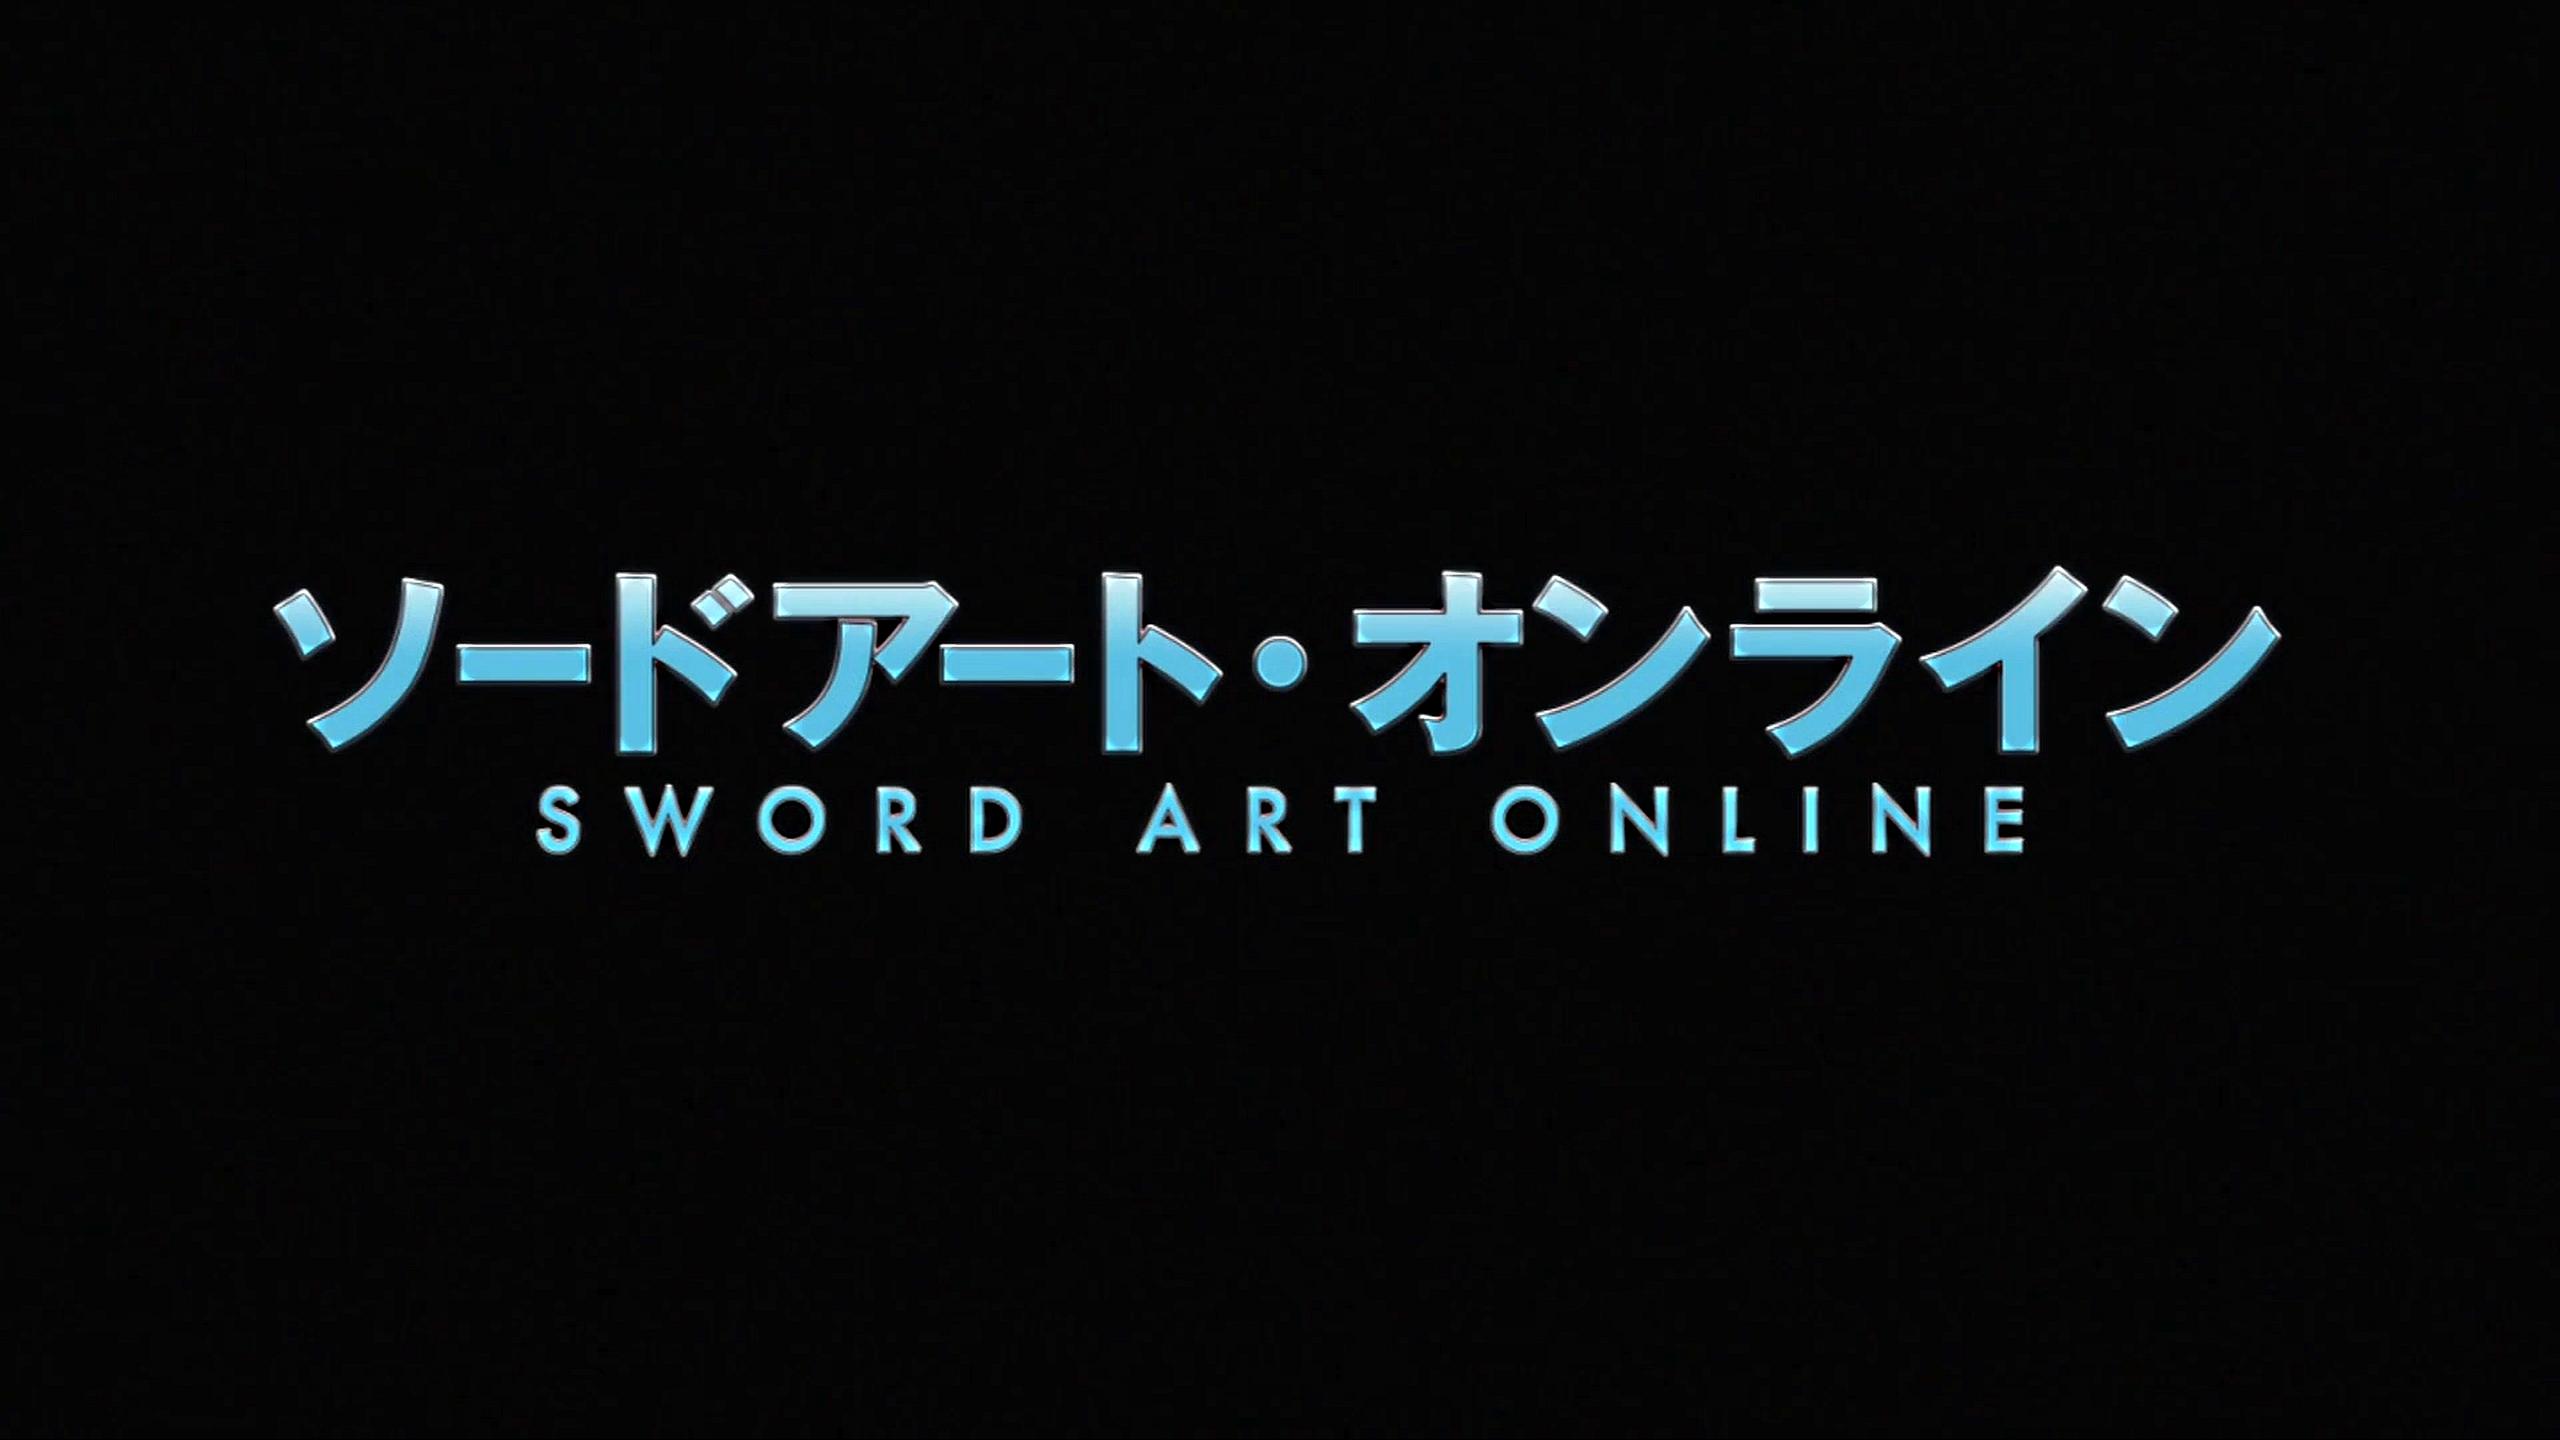 2329 sword art online hd wallpapers background images hd wallpaper background image id328785 2560x1440 anime sword art online biocorpaavc